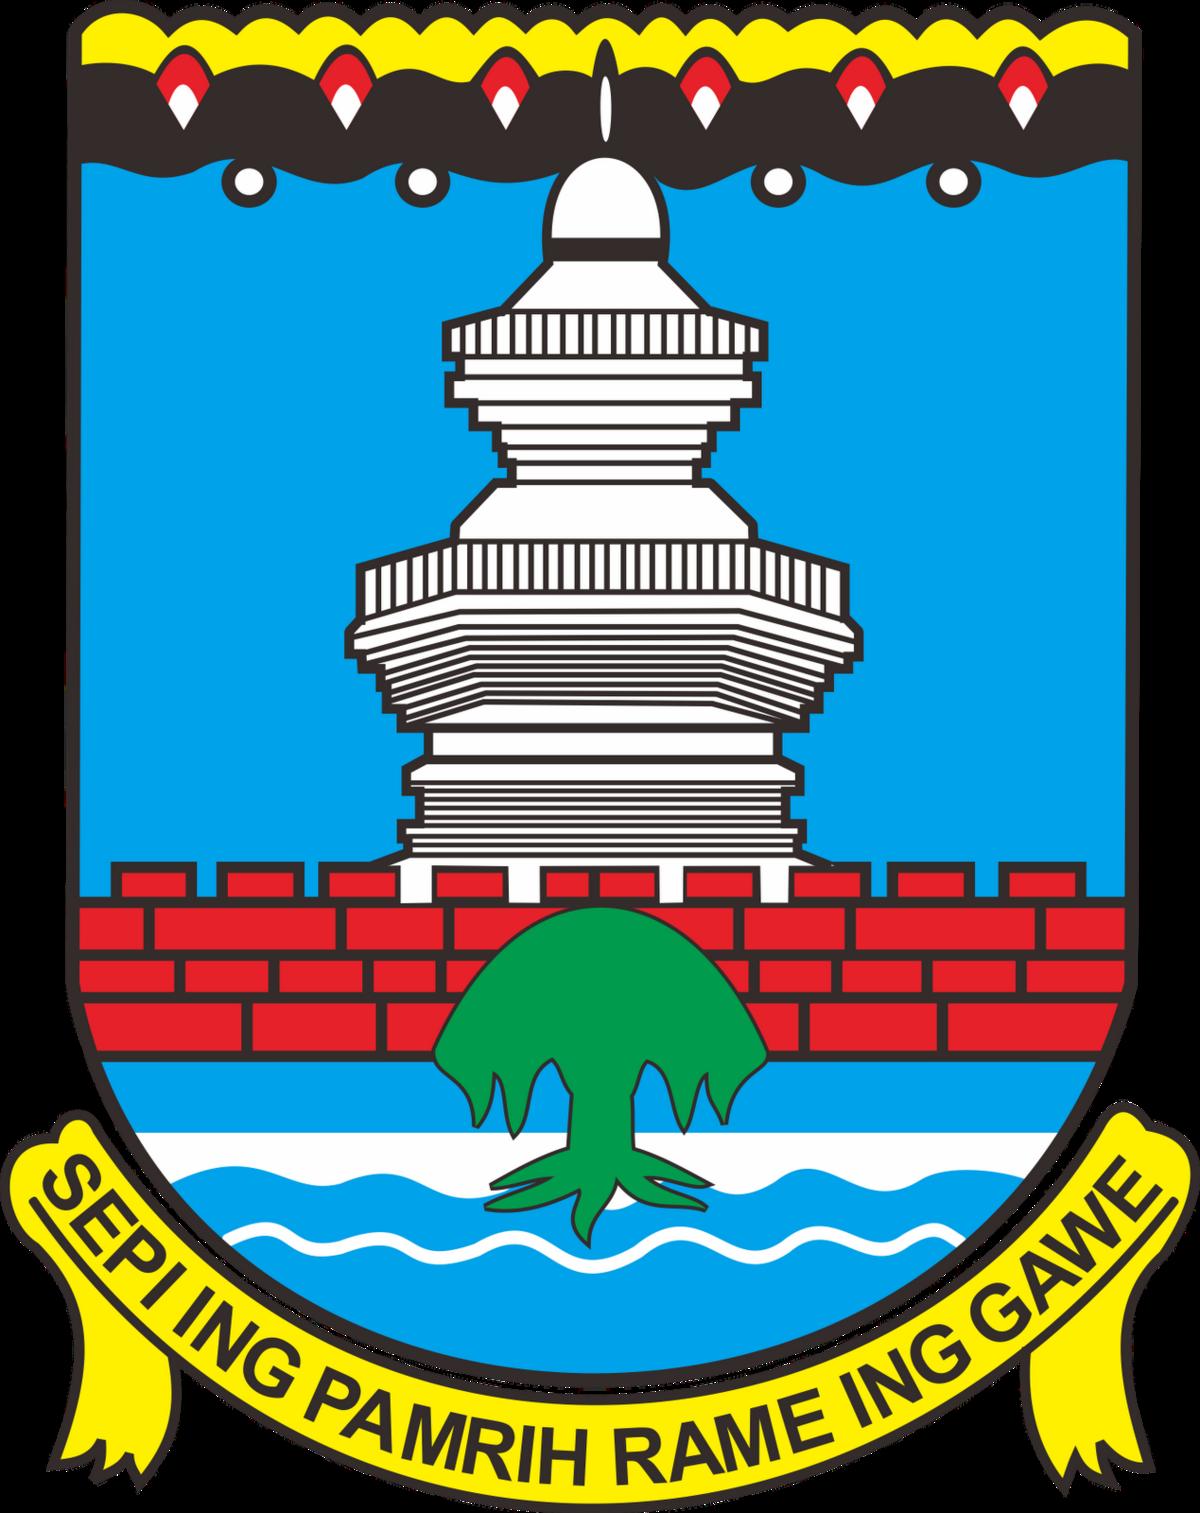 Berkas Logo Kabupaten Serang Png Wikipedia Bahasa Indonesia Ensiklopedia Bebas